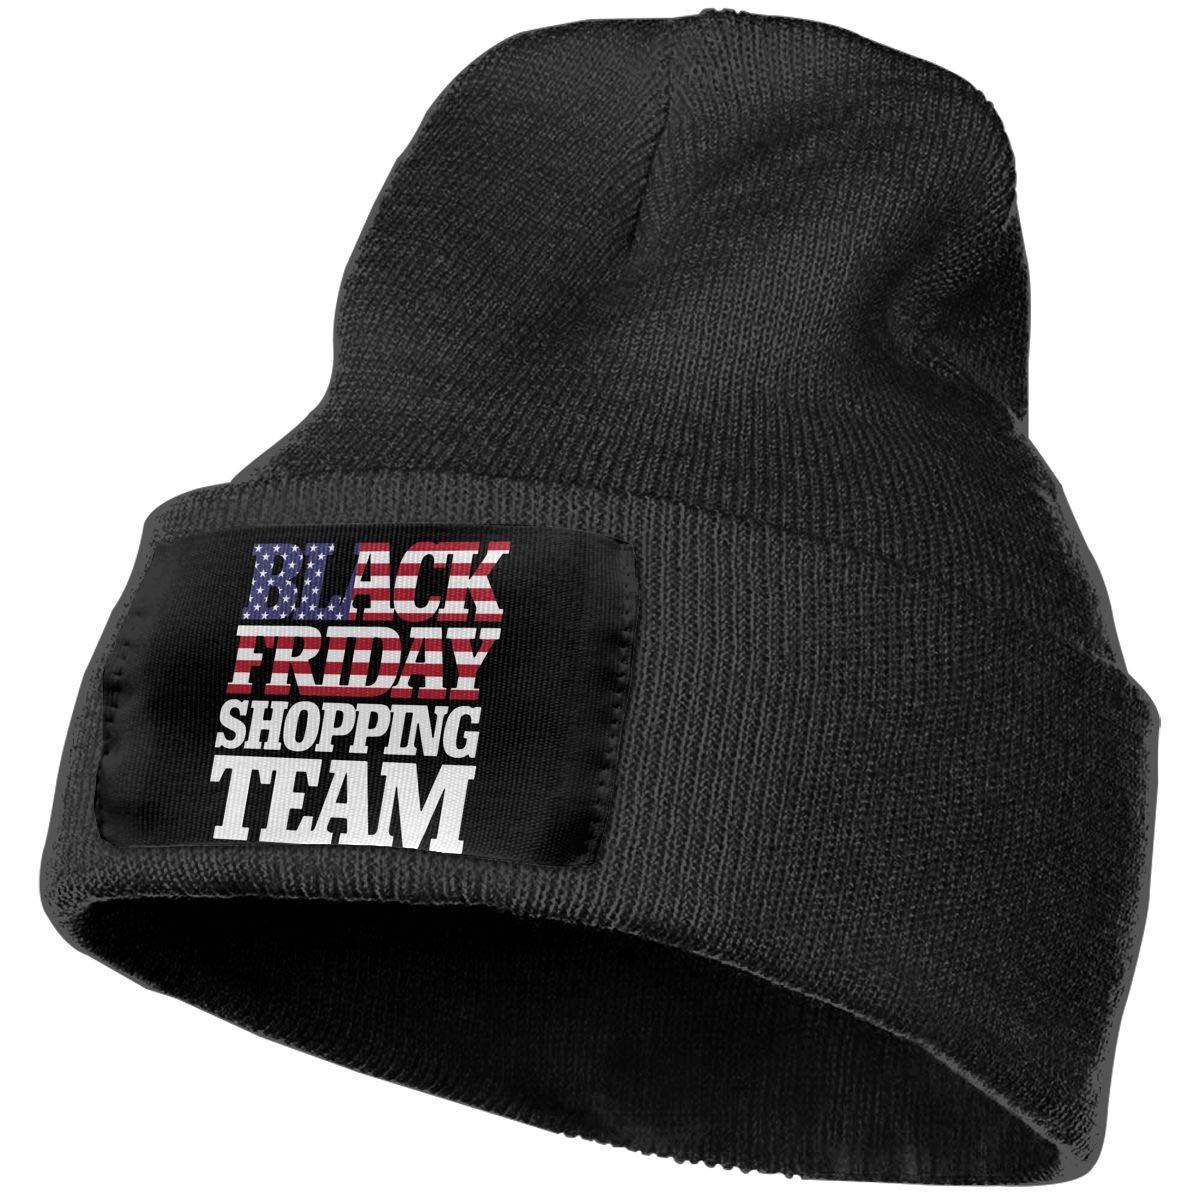 COLLJL-8 Men /& Women American Flag Outdoor Warm Knit Beanies Hat Soft Winter Skull Caps